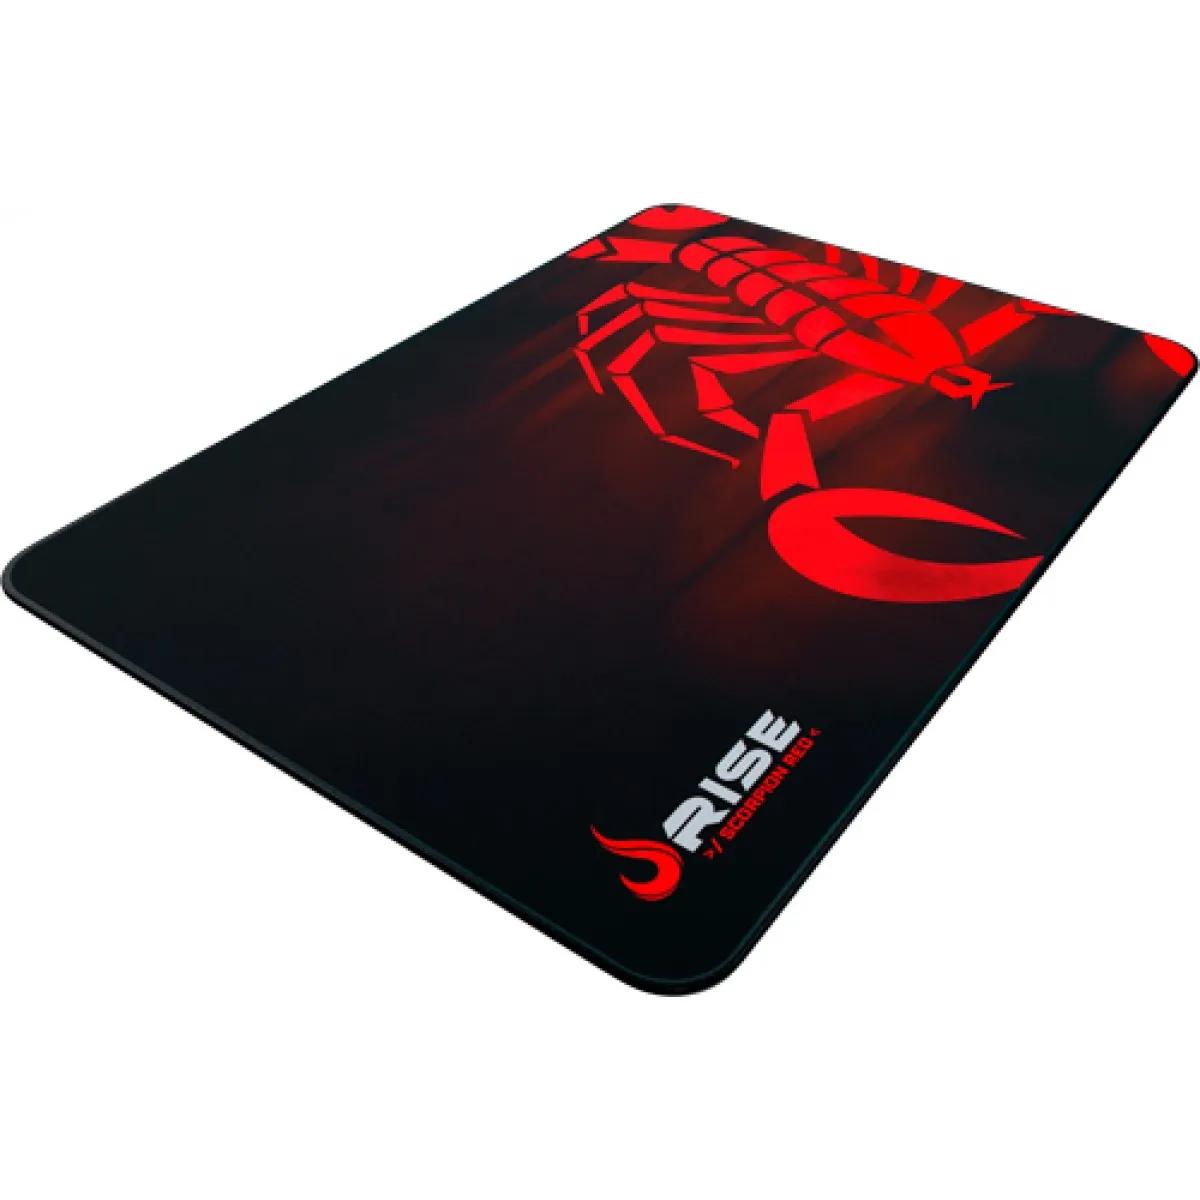 MousePad Gamer Rise Grande 42x29 cm Scorpion Vermelho RG-MP-05-SR